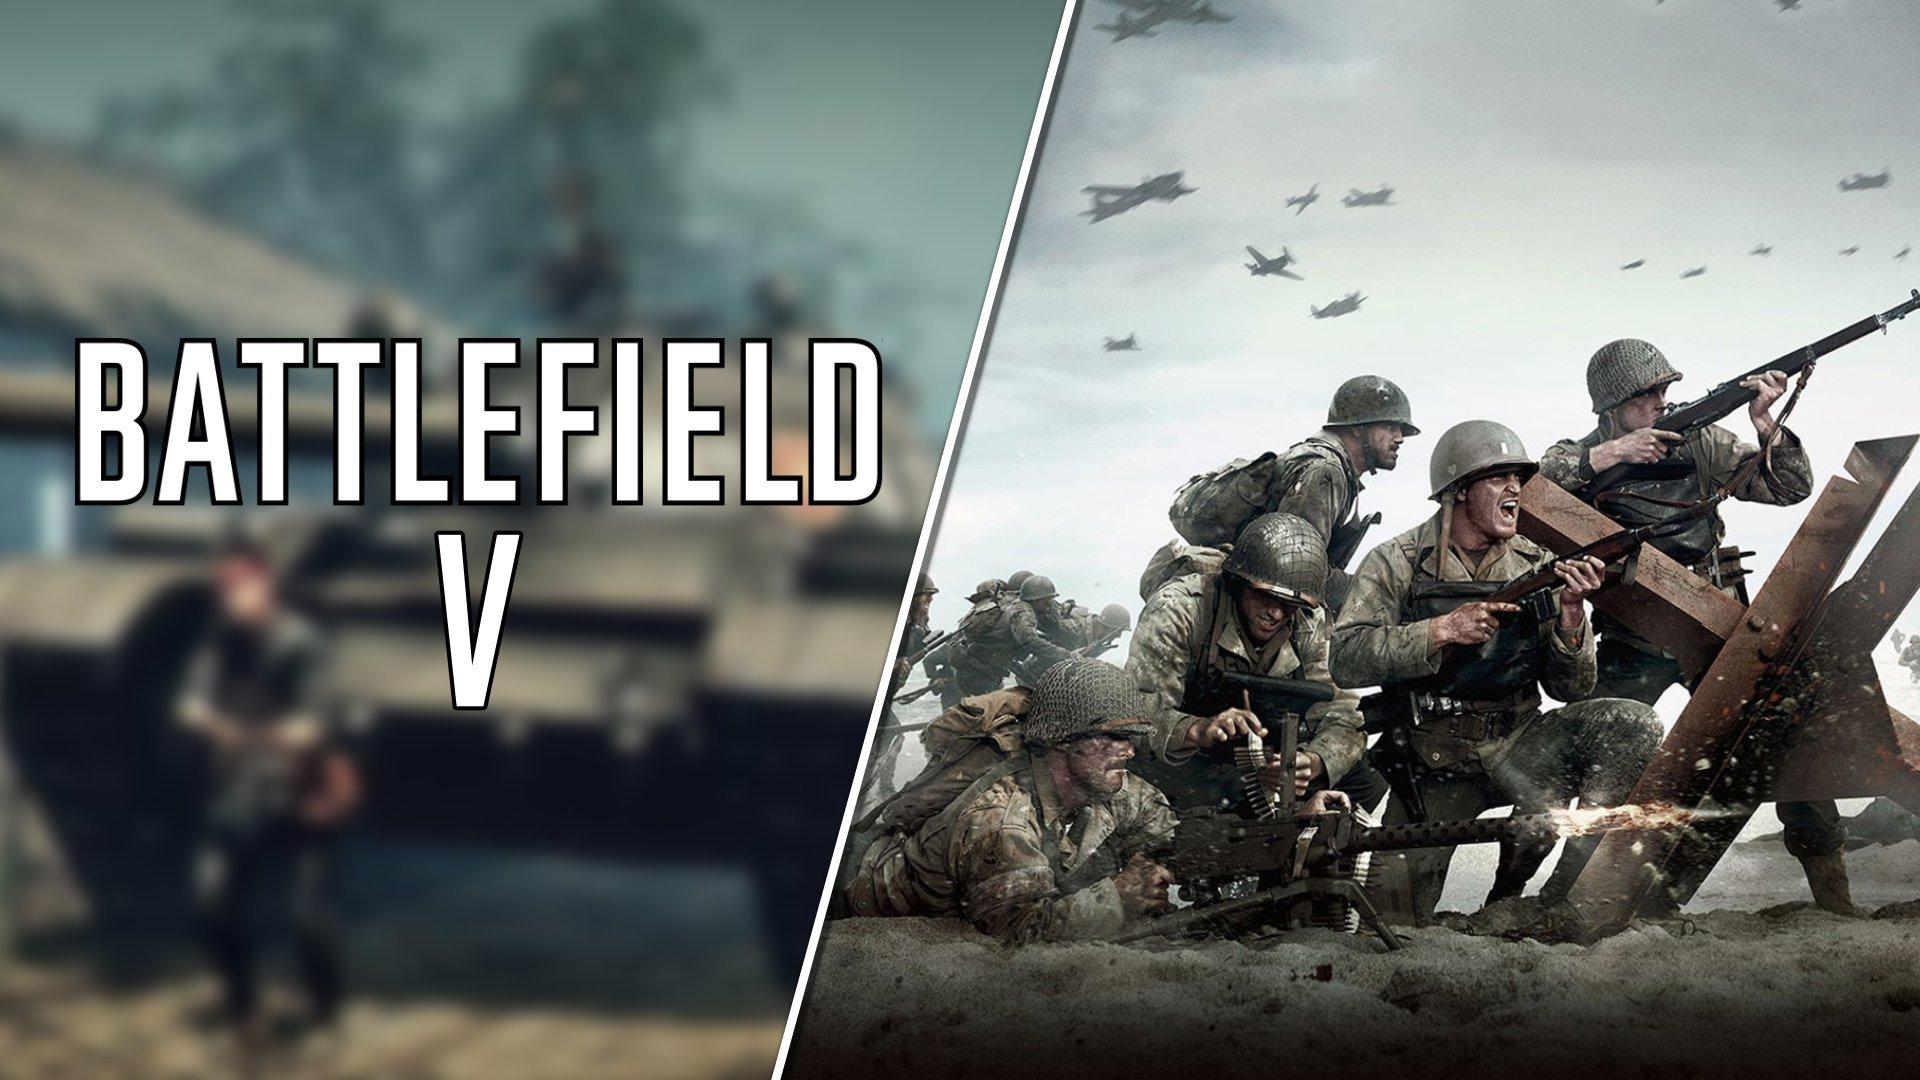 Battlefield V / Battlefield 1 / Battlefield Hardline